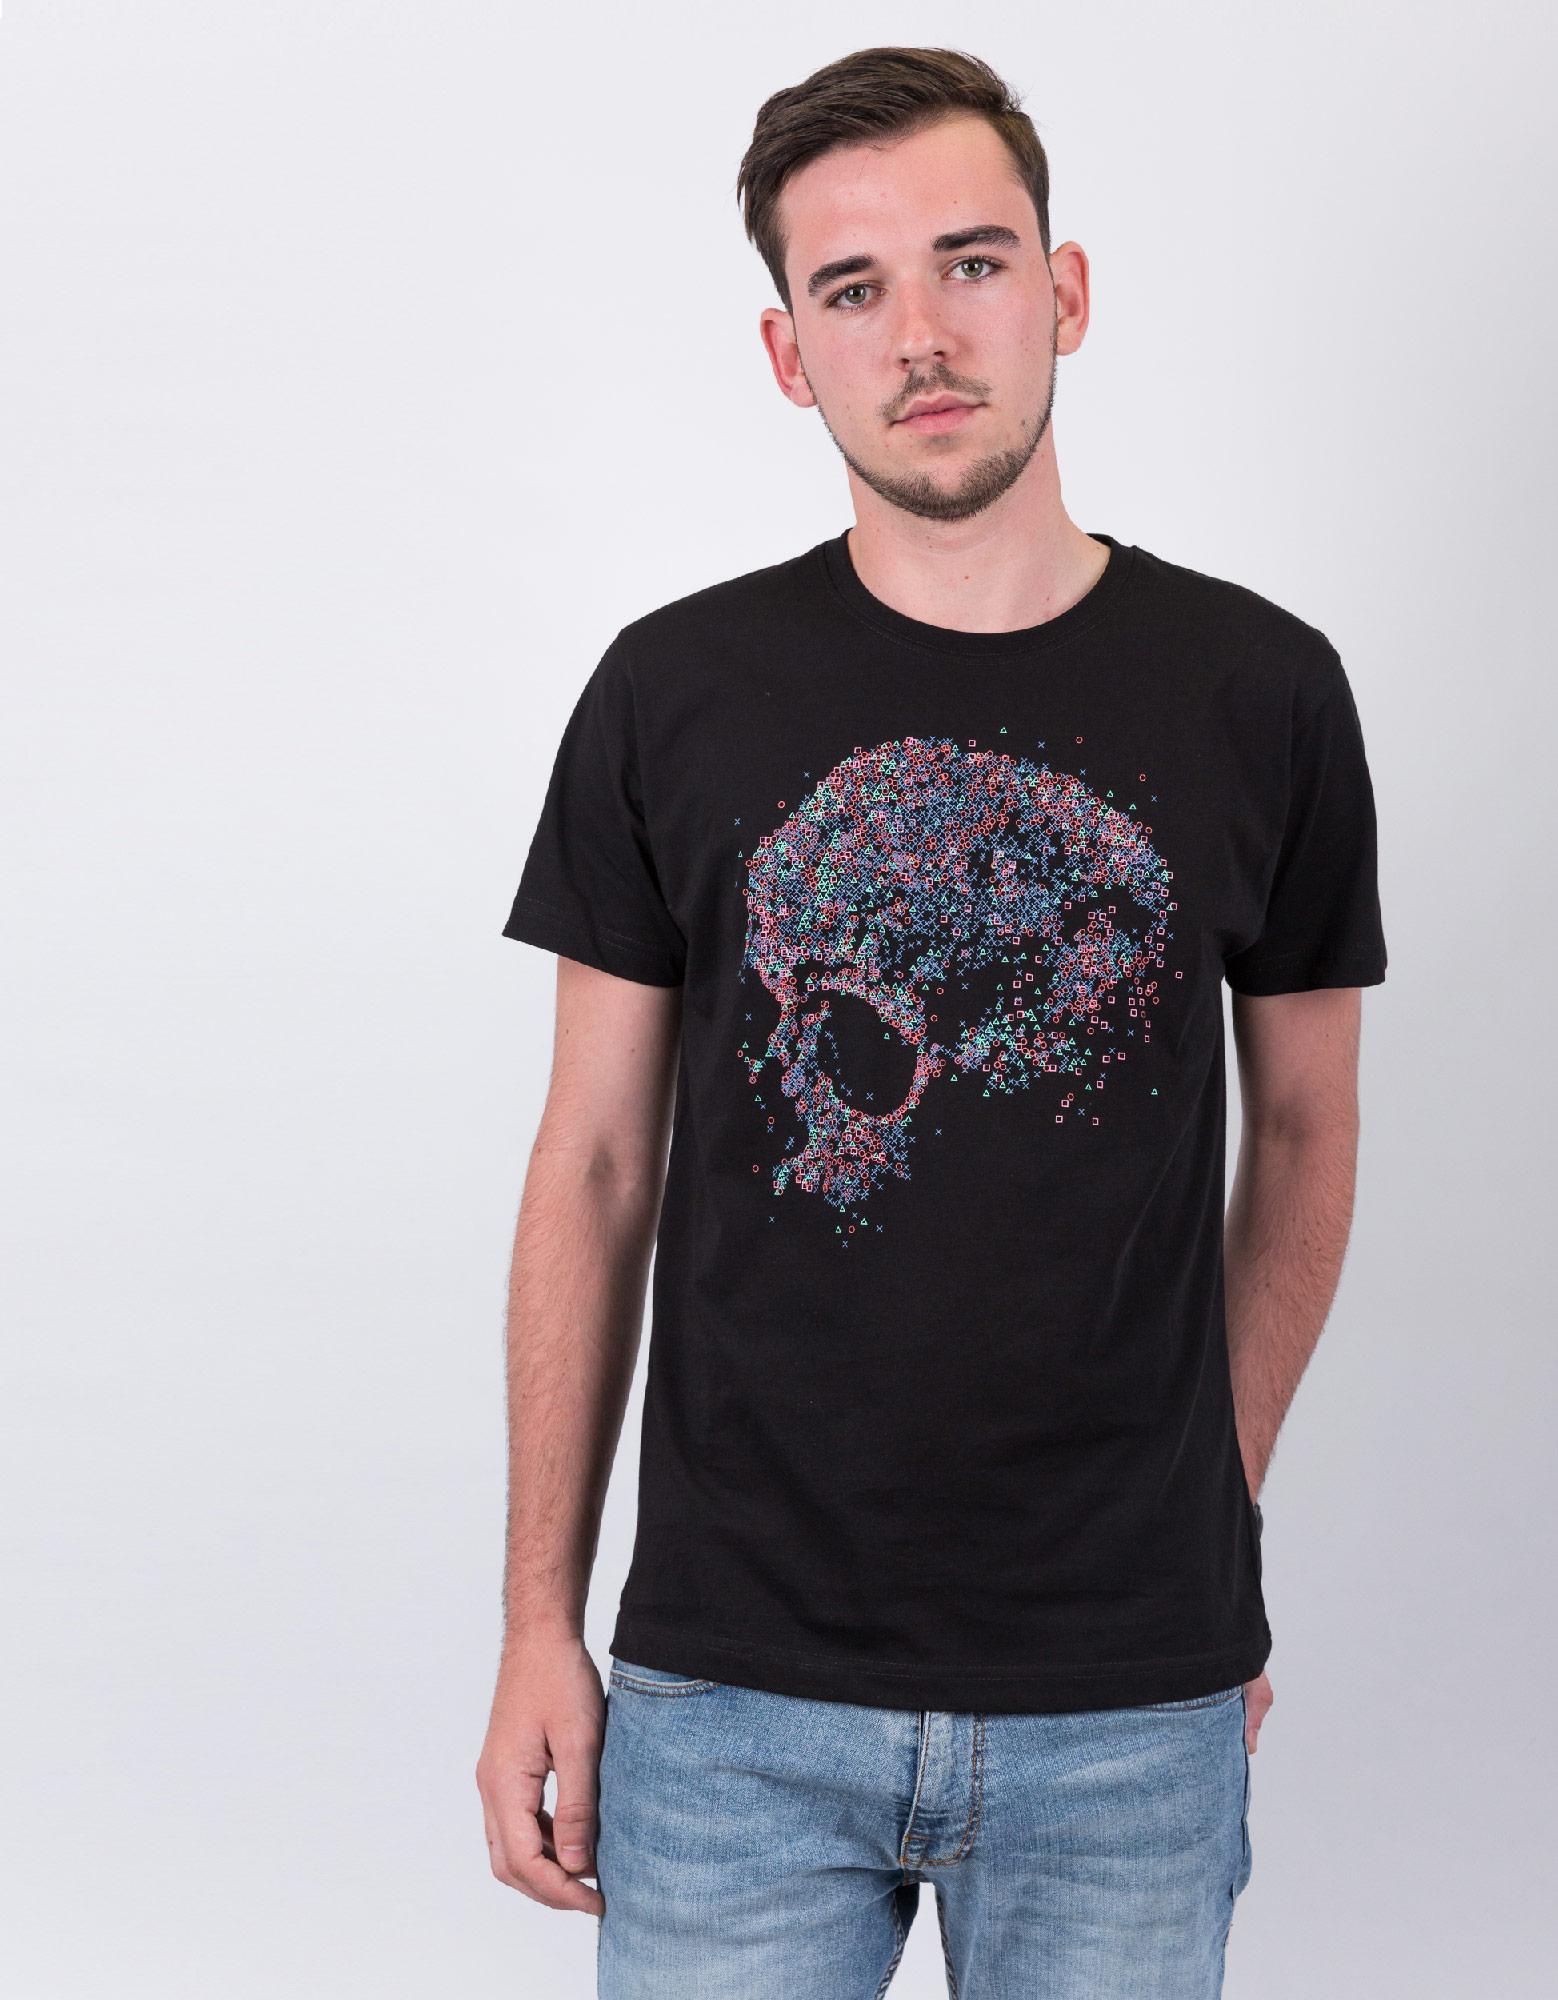 Jo-Bedu Playstation Black Men'S T-Shirt L